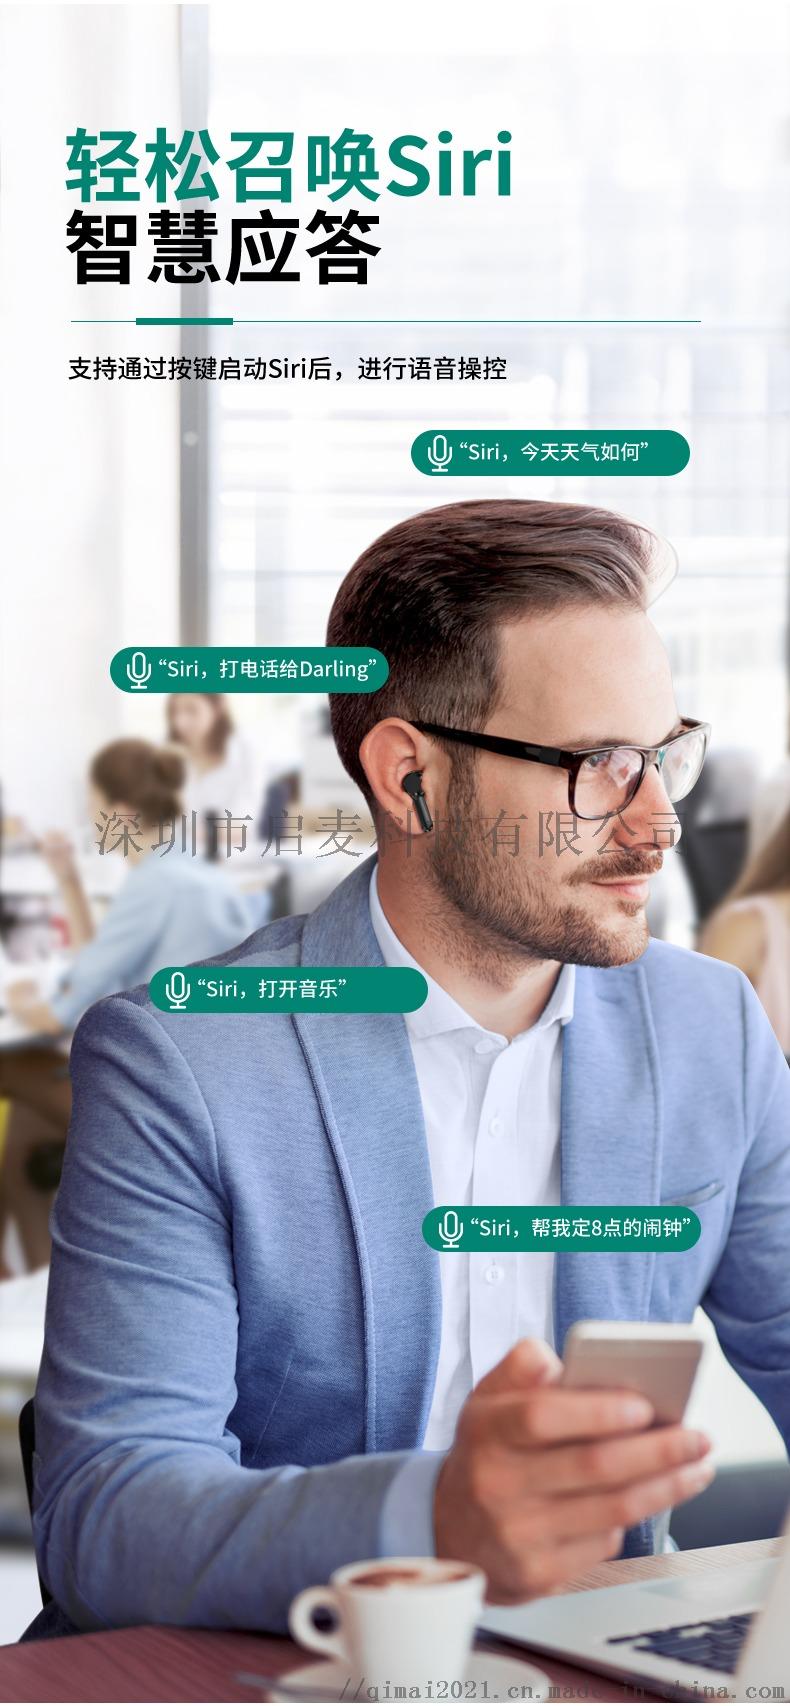 L2蓝牙降噪耳机中文版_10.jpg